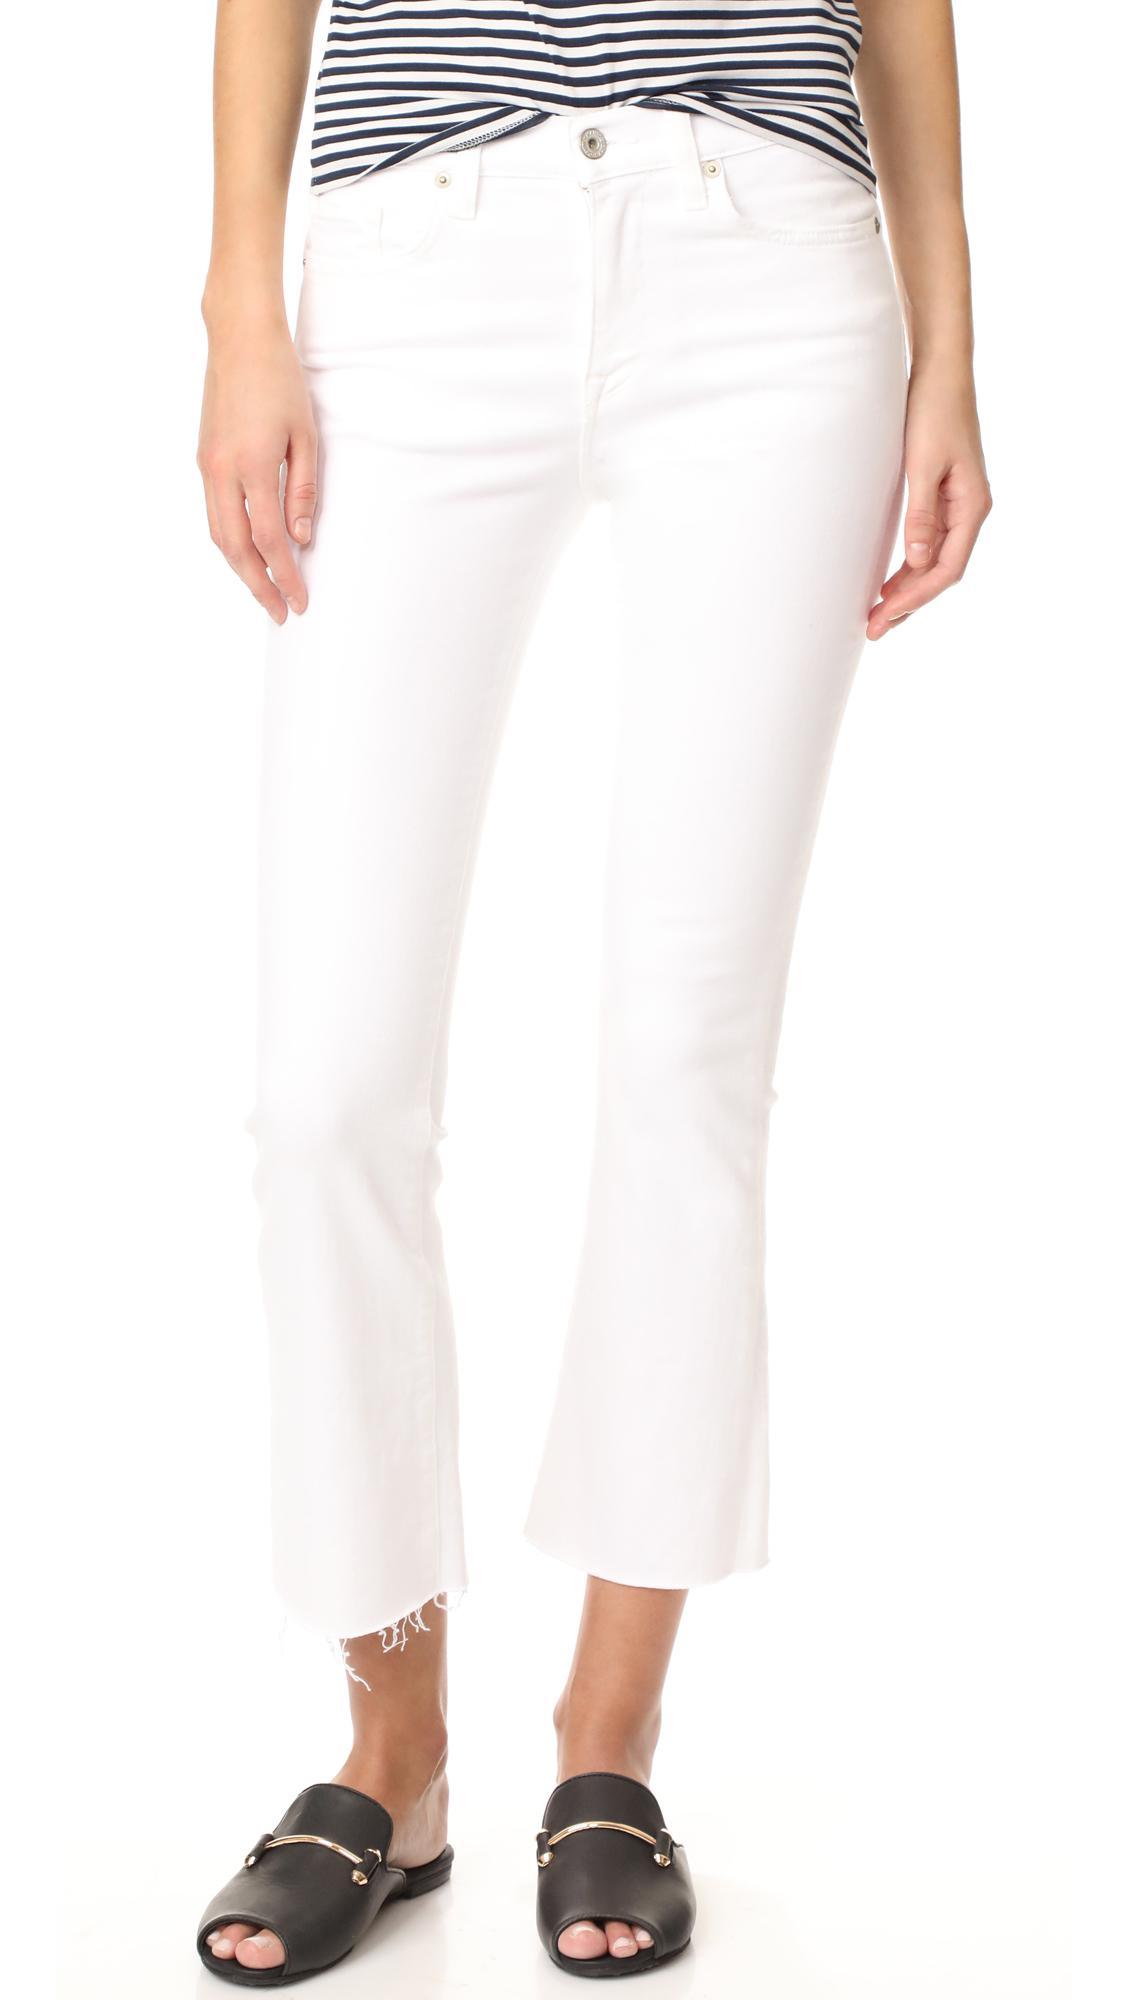 Recommend Buy Cheap Footlocker Womens Maxwell Crop Flared Jeans Baldwin Prices Cheap Price 100% Original Online ZUz3Vnf